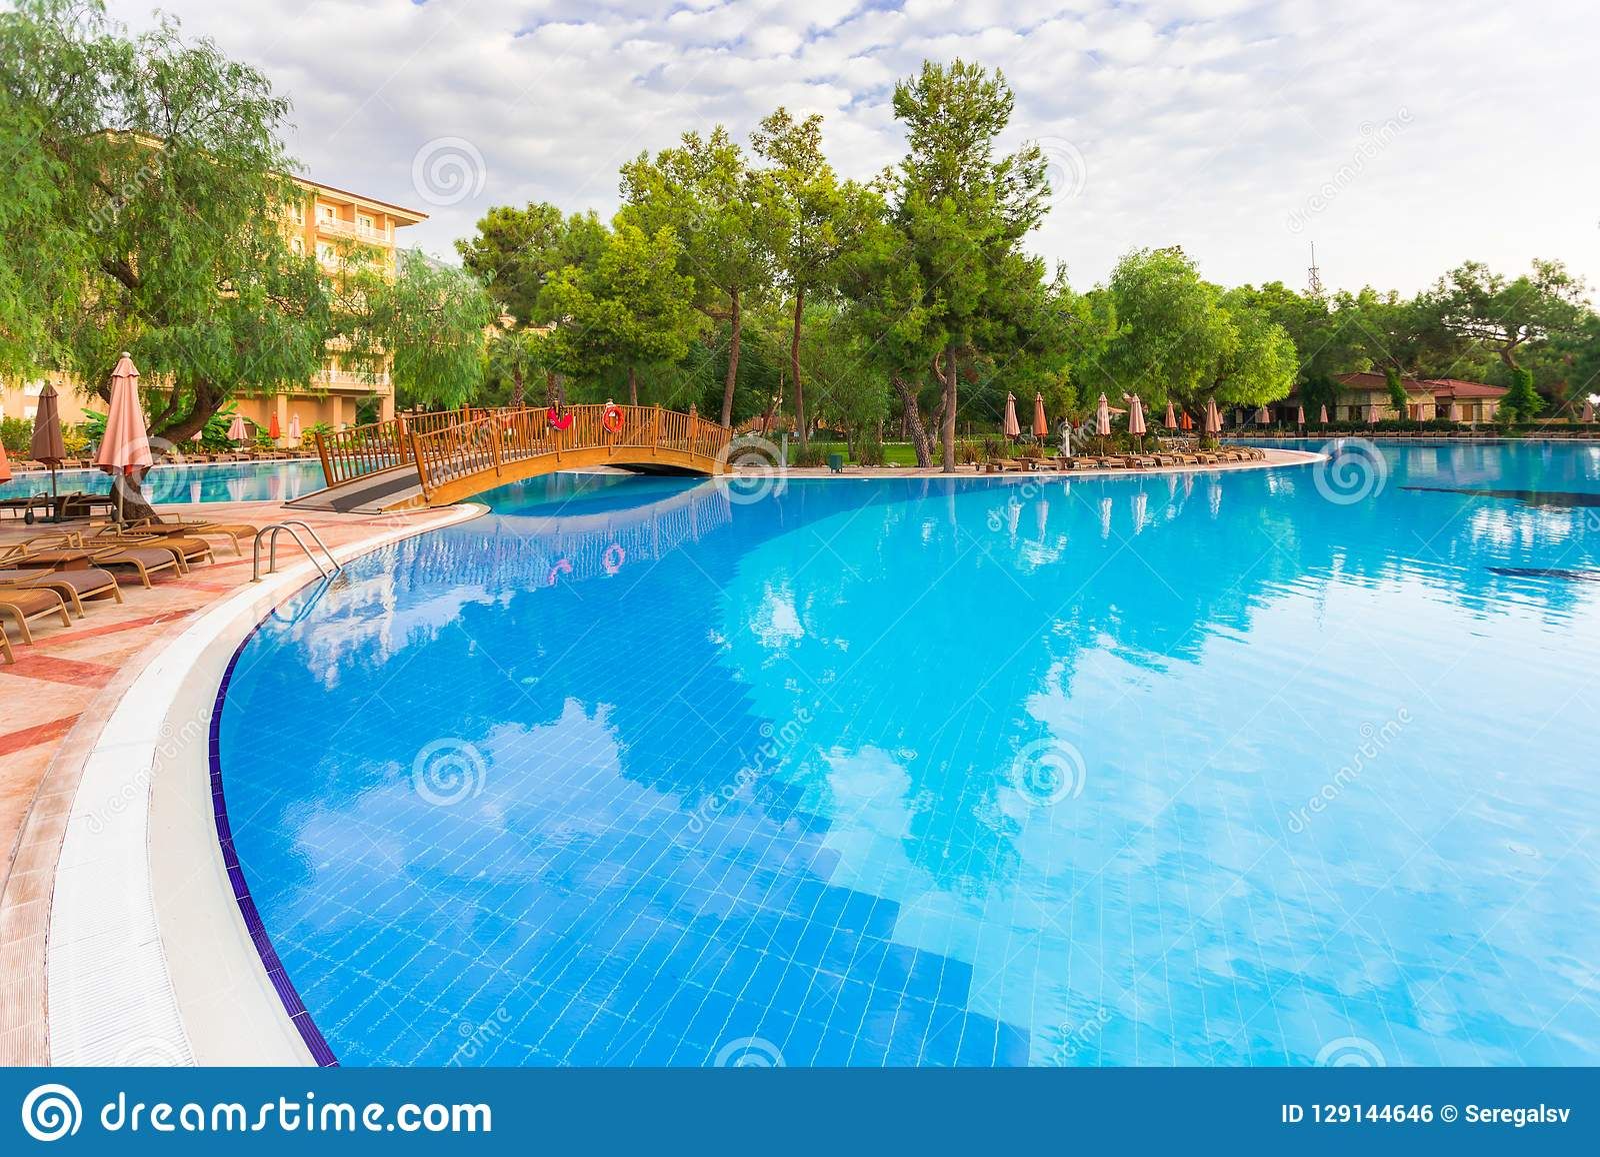 Swimming Pool Of Luxury Hotel Stock Photo Image Of Swimming